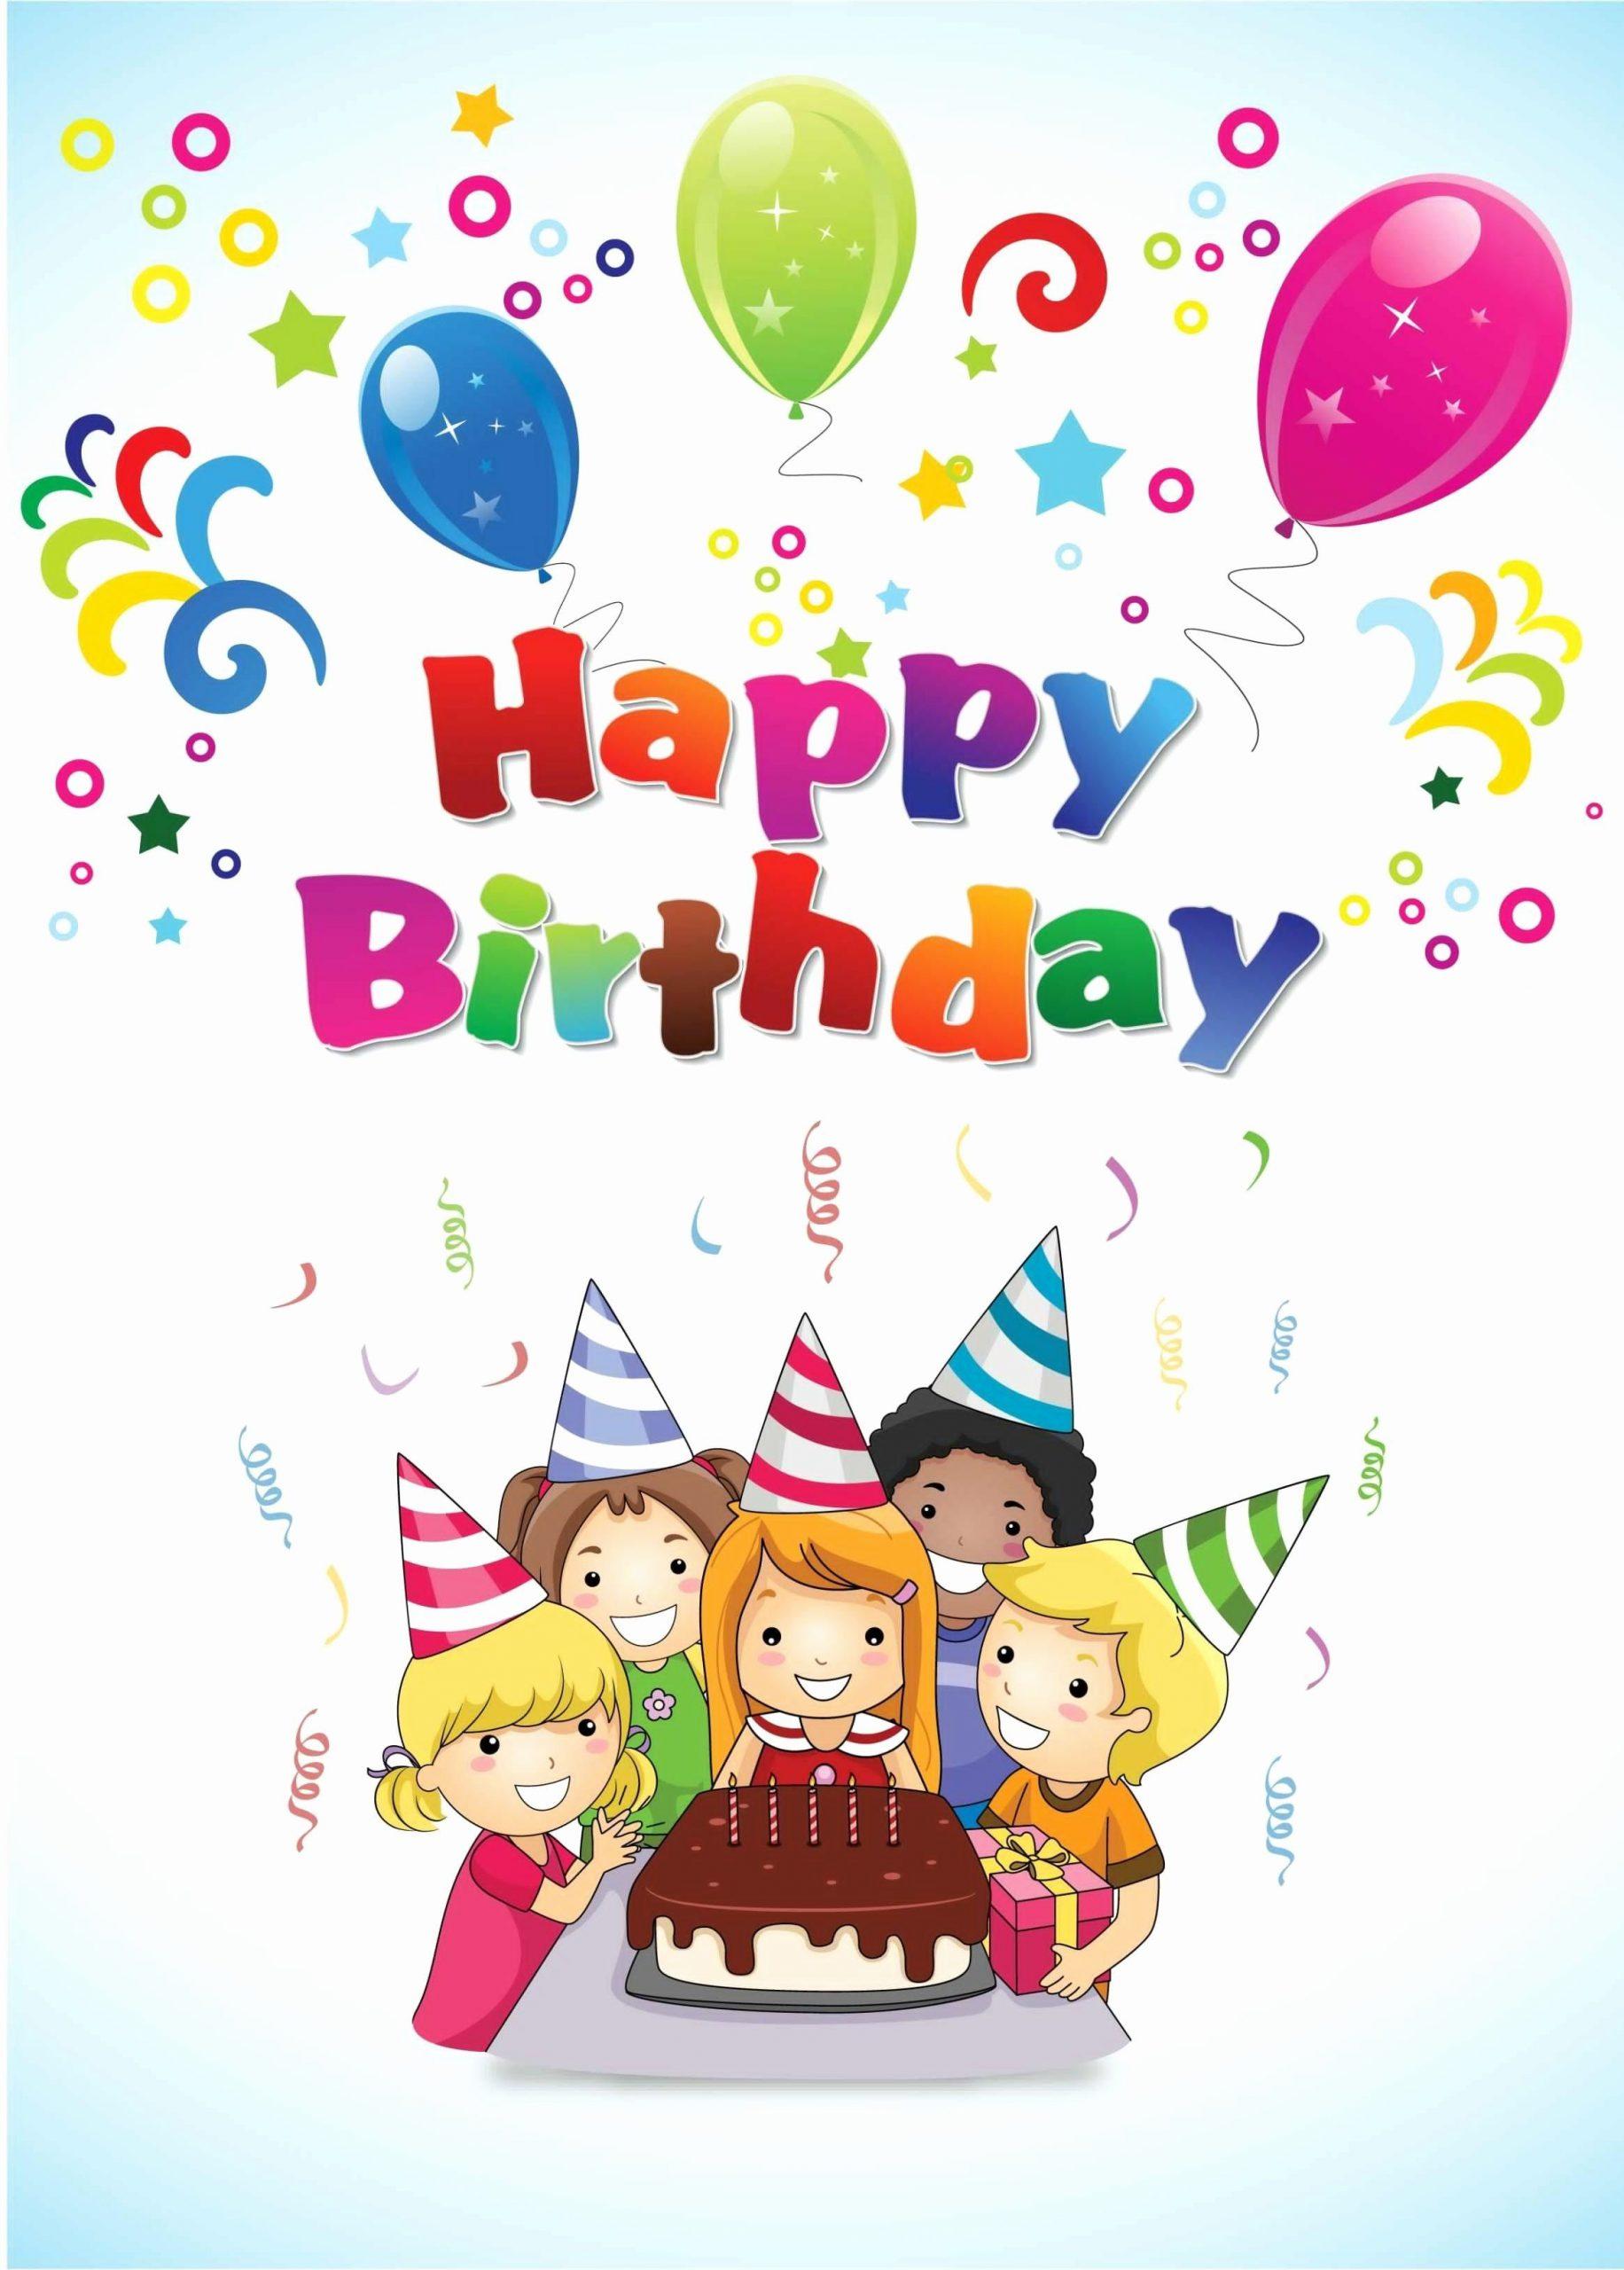 Kisseo Geburtstagskarten.die 20 Beliebtesten Ideen ganzes Geburtstagskarten Kinder